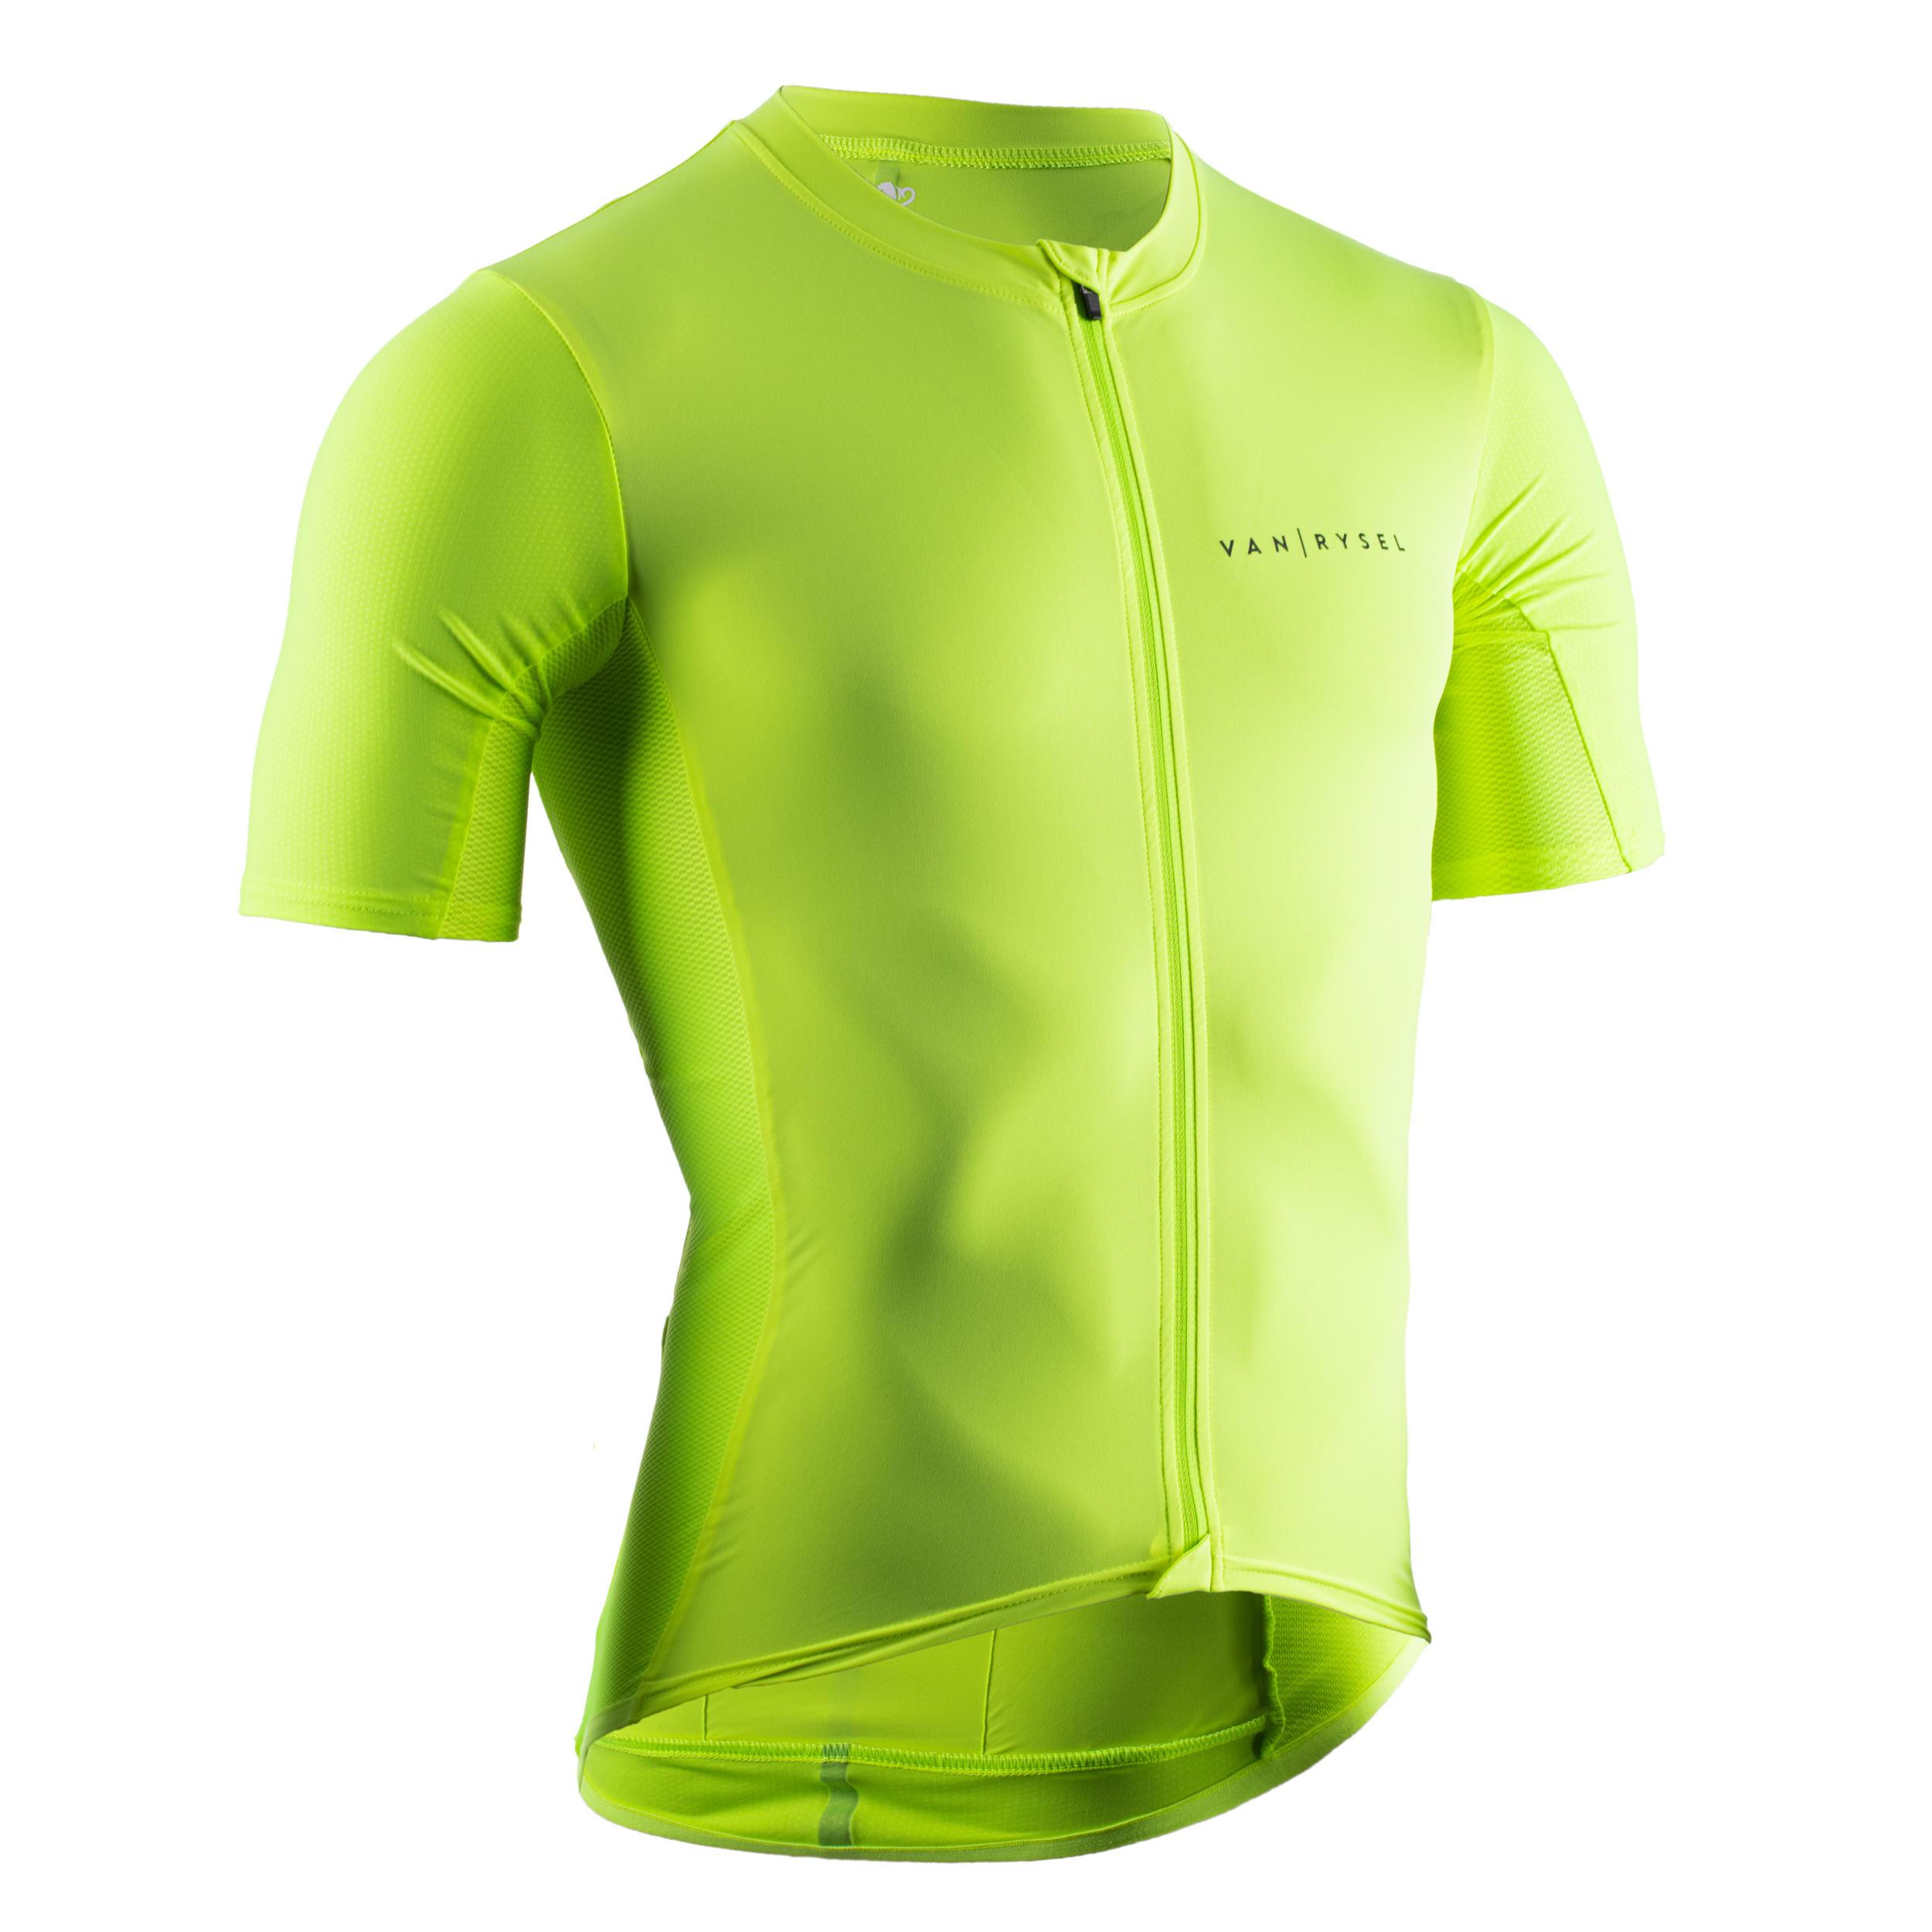 Radtrikot kurzarm Rennrad NEO-RACER   Sportbekleidung > Trikots > Fahrradtrikots   Van rysel